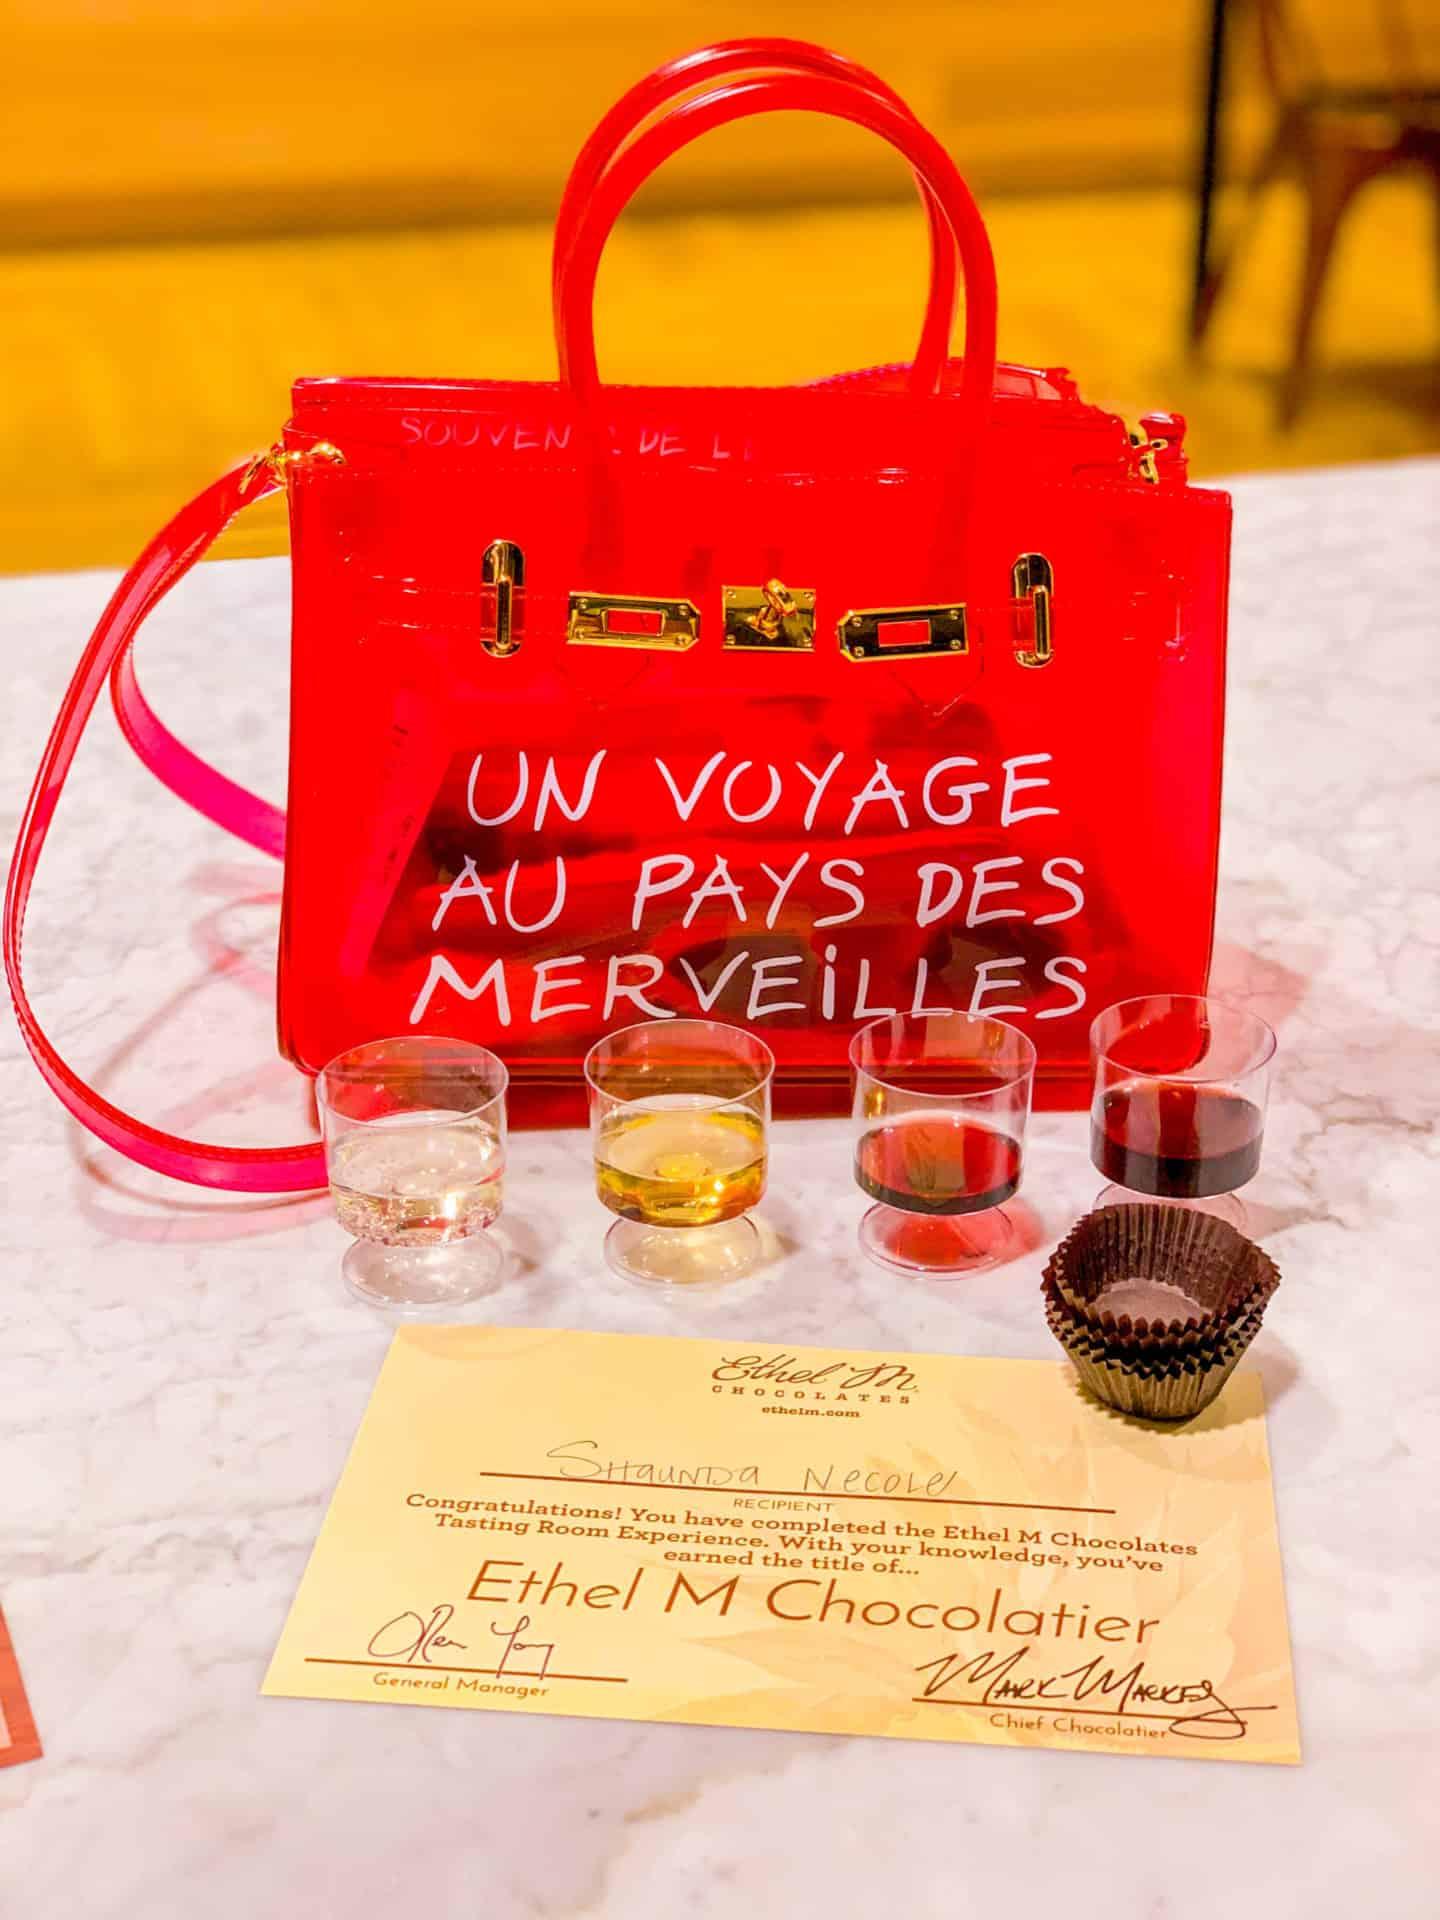 Ethel M Chocolatier - Date Night Wine Tasting Experience